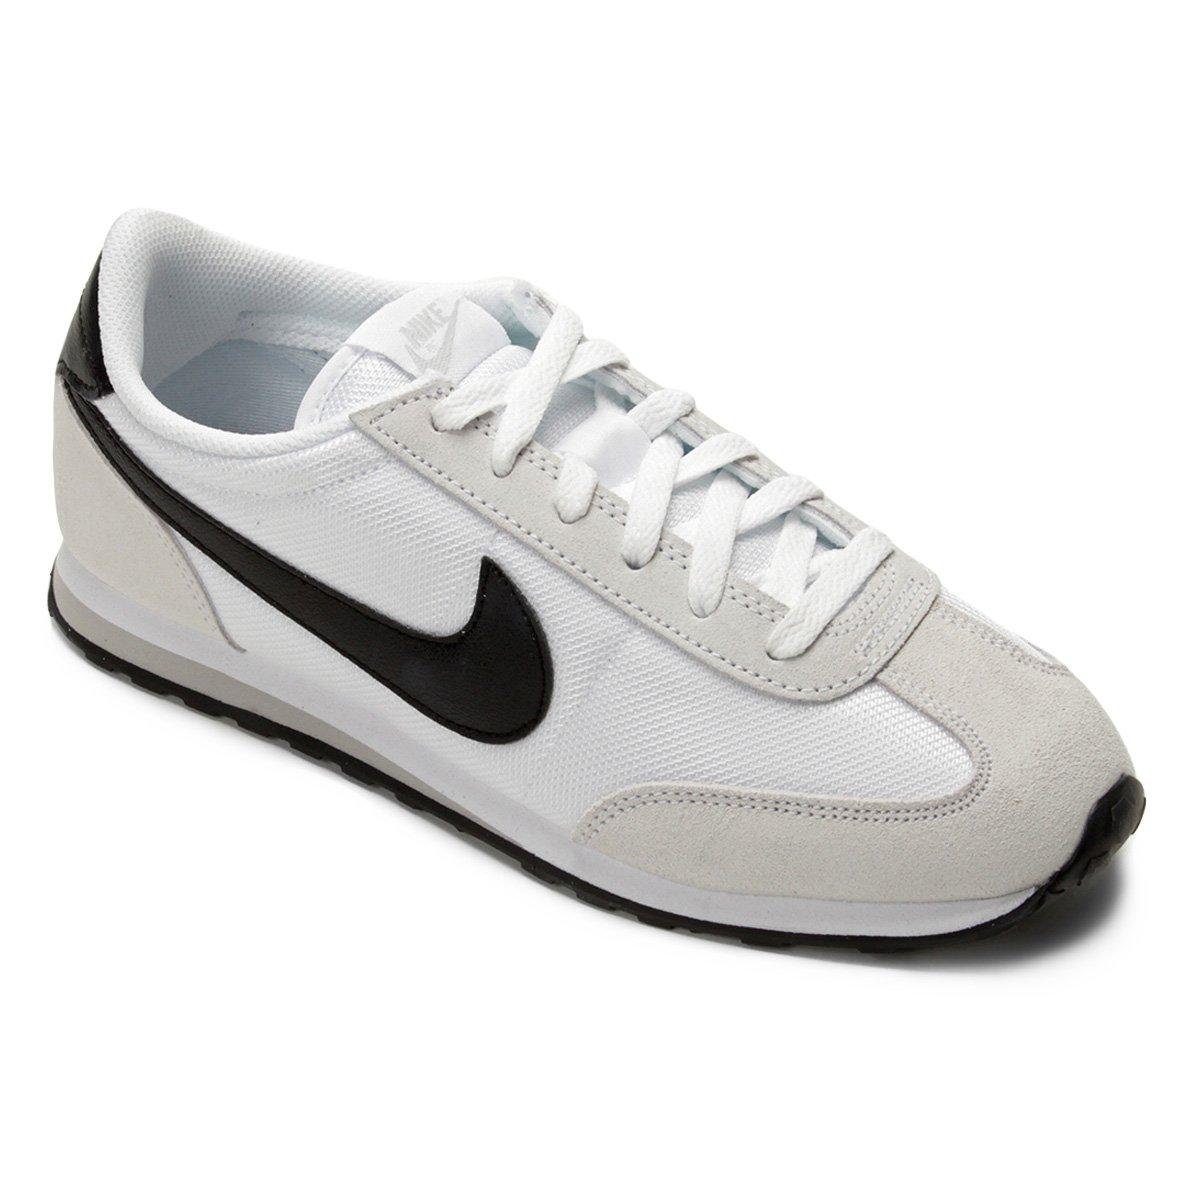 e1168ee85bb Tênis Nike Mach Runner Masculino - Branco e Cinza - Compre Agora ...